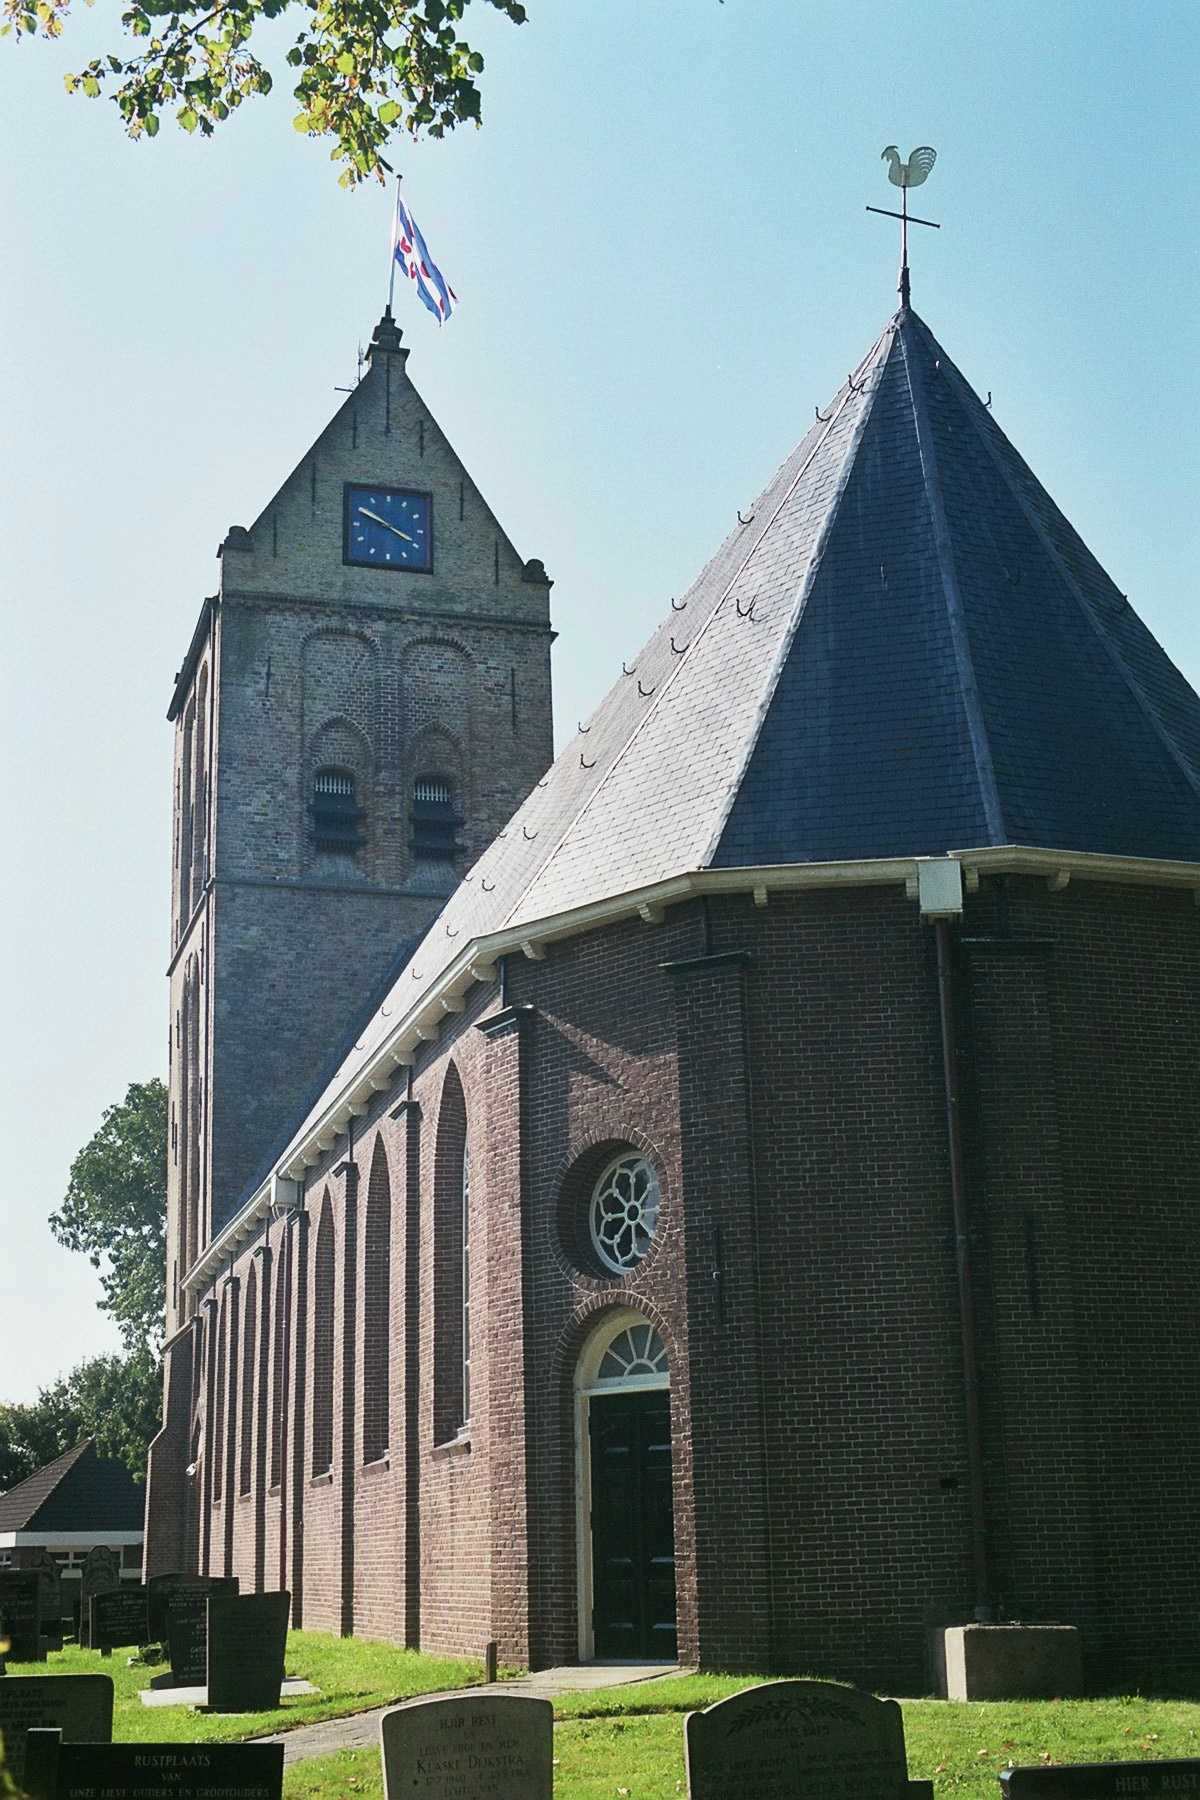 Bestand:Spannum.N.H.Kerk.30 aug.2008.87-13.jpg - Reliwiki